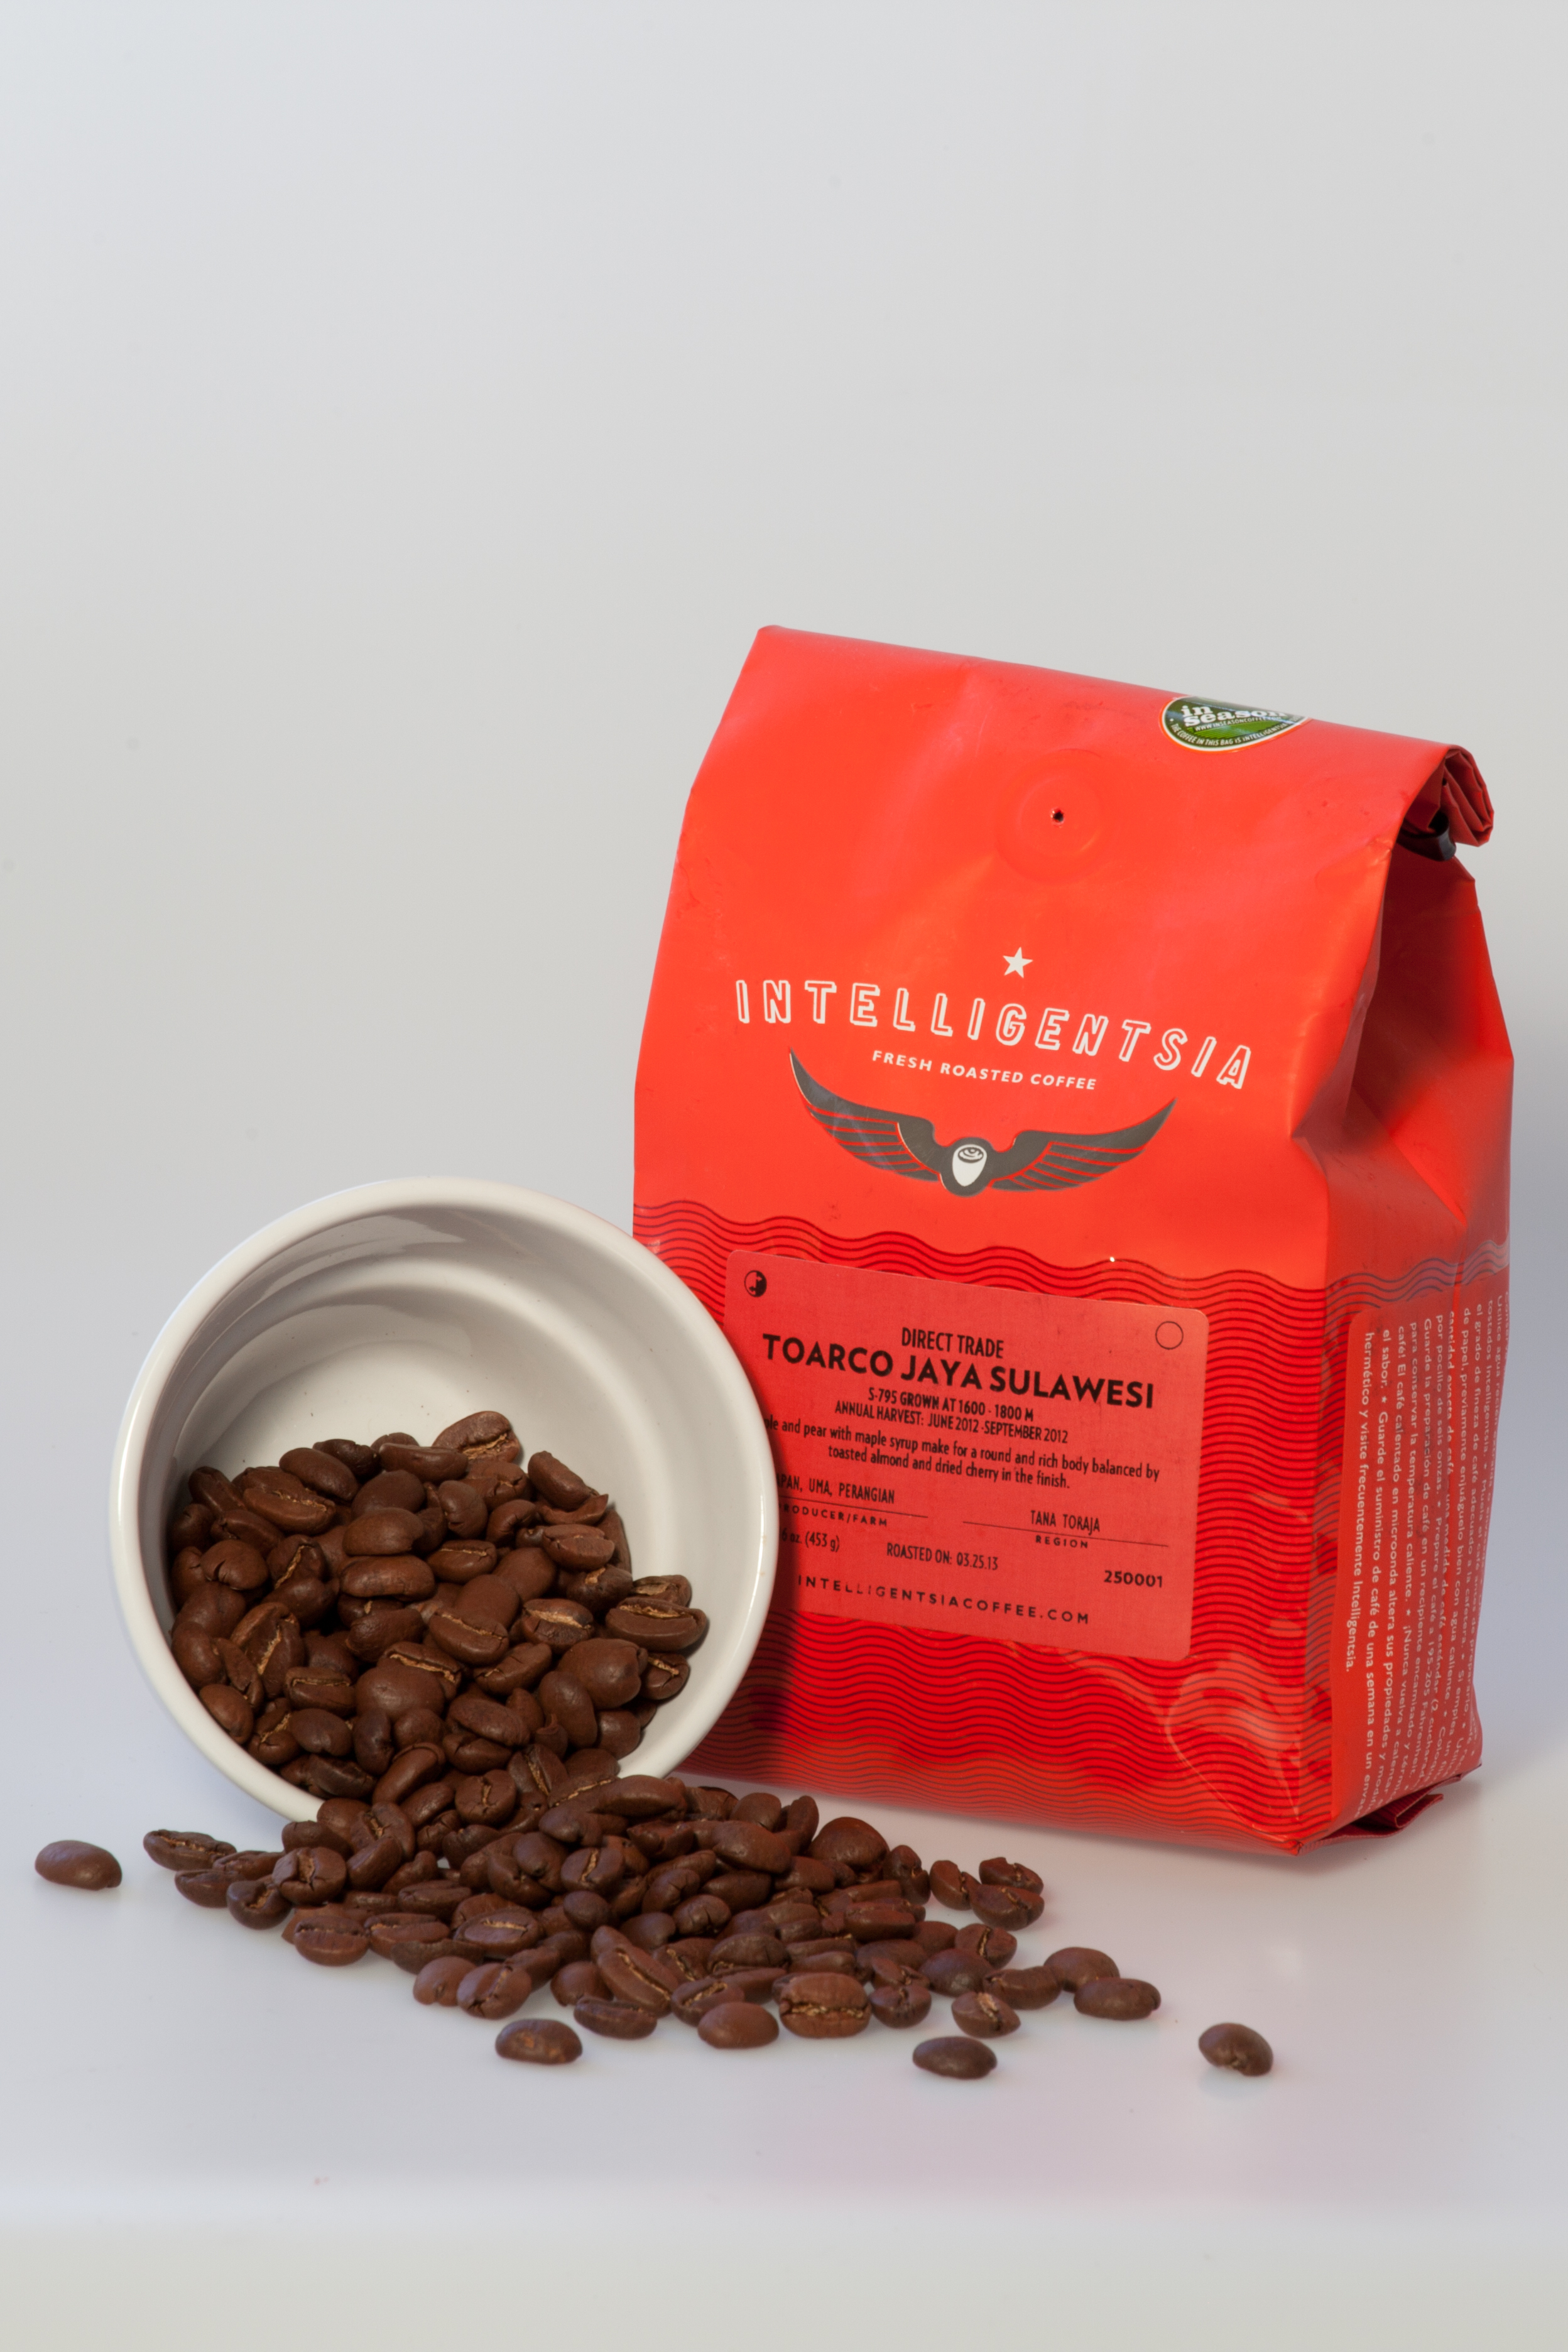 Joyride Coffee Distributors- Toarco Coffee (2 of 4)